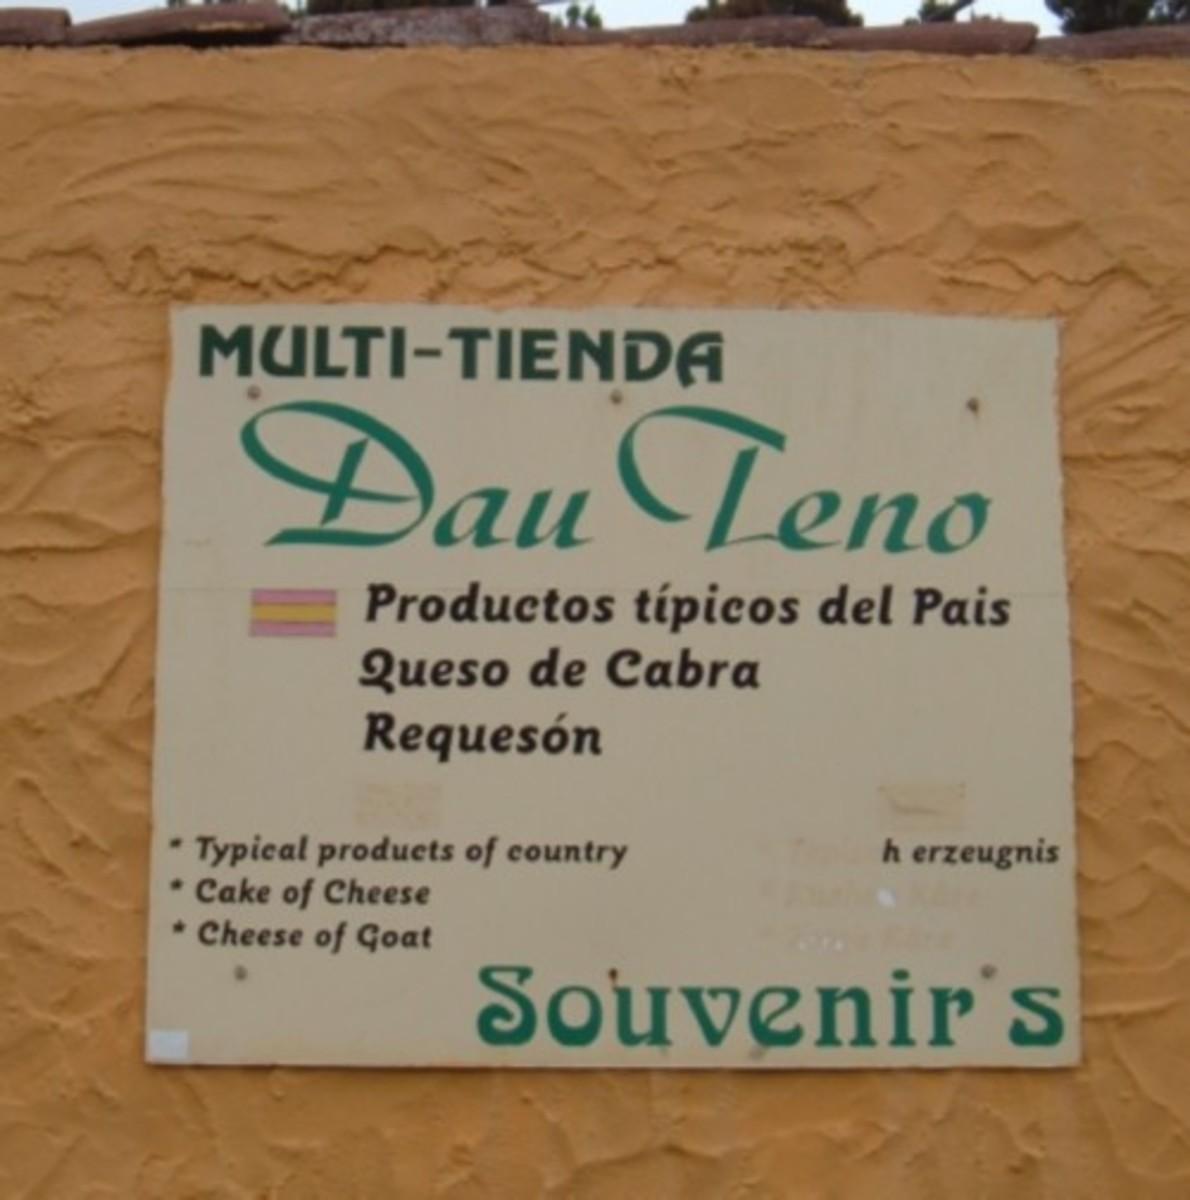 Shop sign in Teno Alto